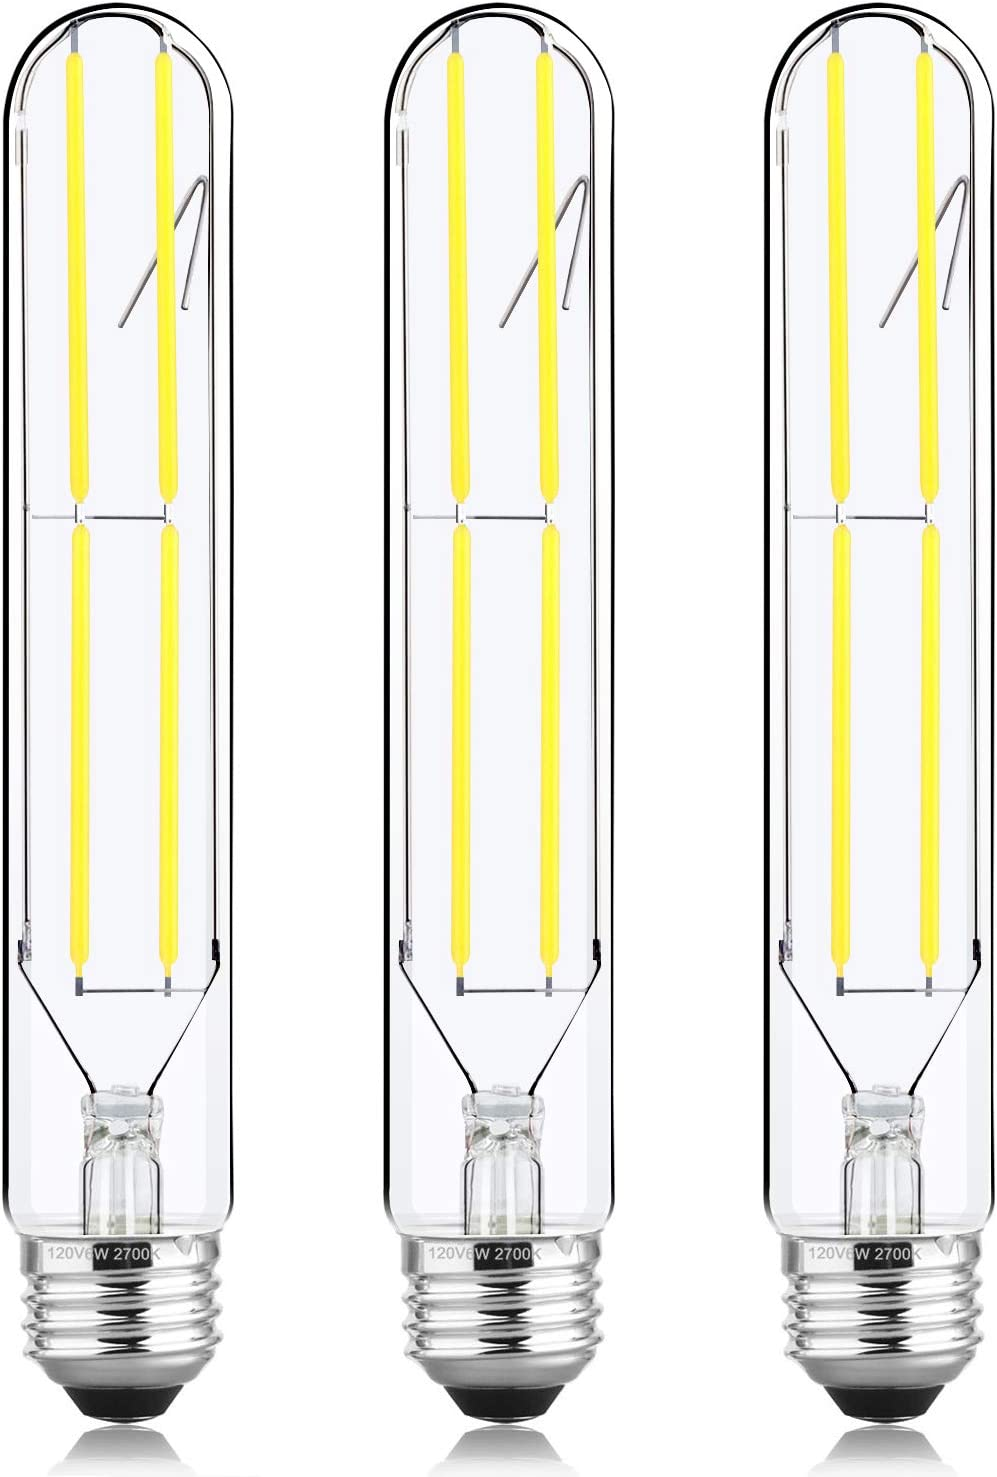 HXMLS T10 Dimmable 6W Tubular LED Bulbs,Daylight 4000K,Edison Style Filament Light Bulb T30,Vintage Bulb 60 Watt Equivalent, E26 Medium Base 600LM,Clear Glass Cover …